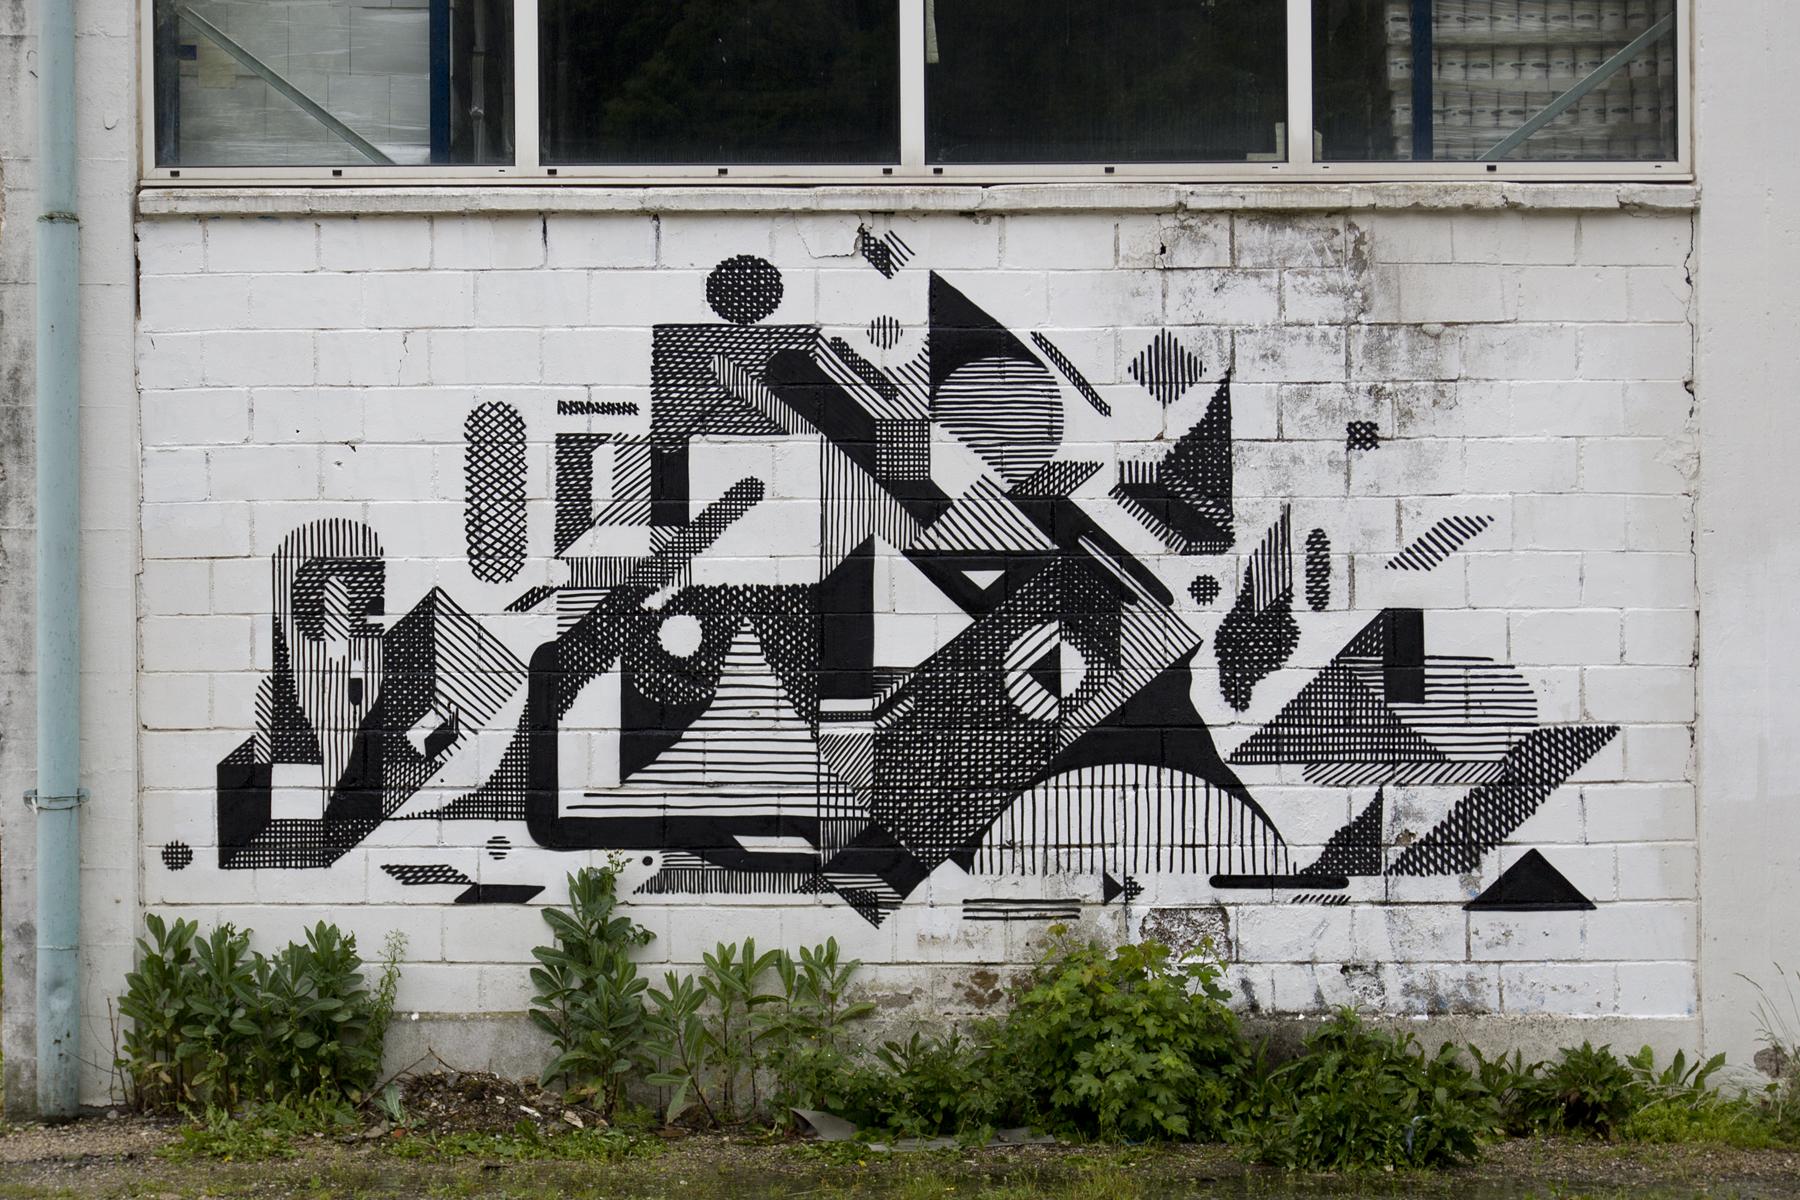 nelio-new-mural-in-besancon-france-01